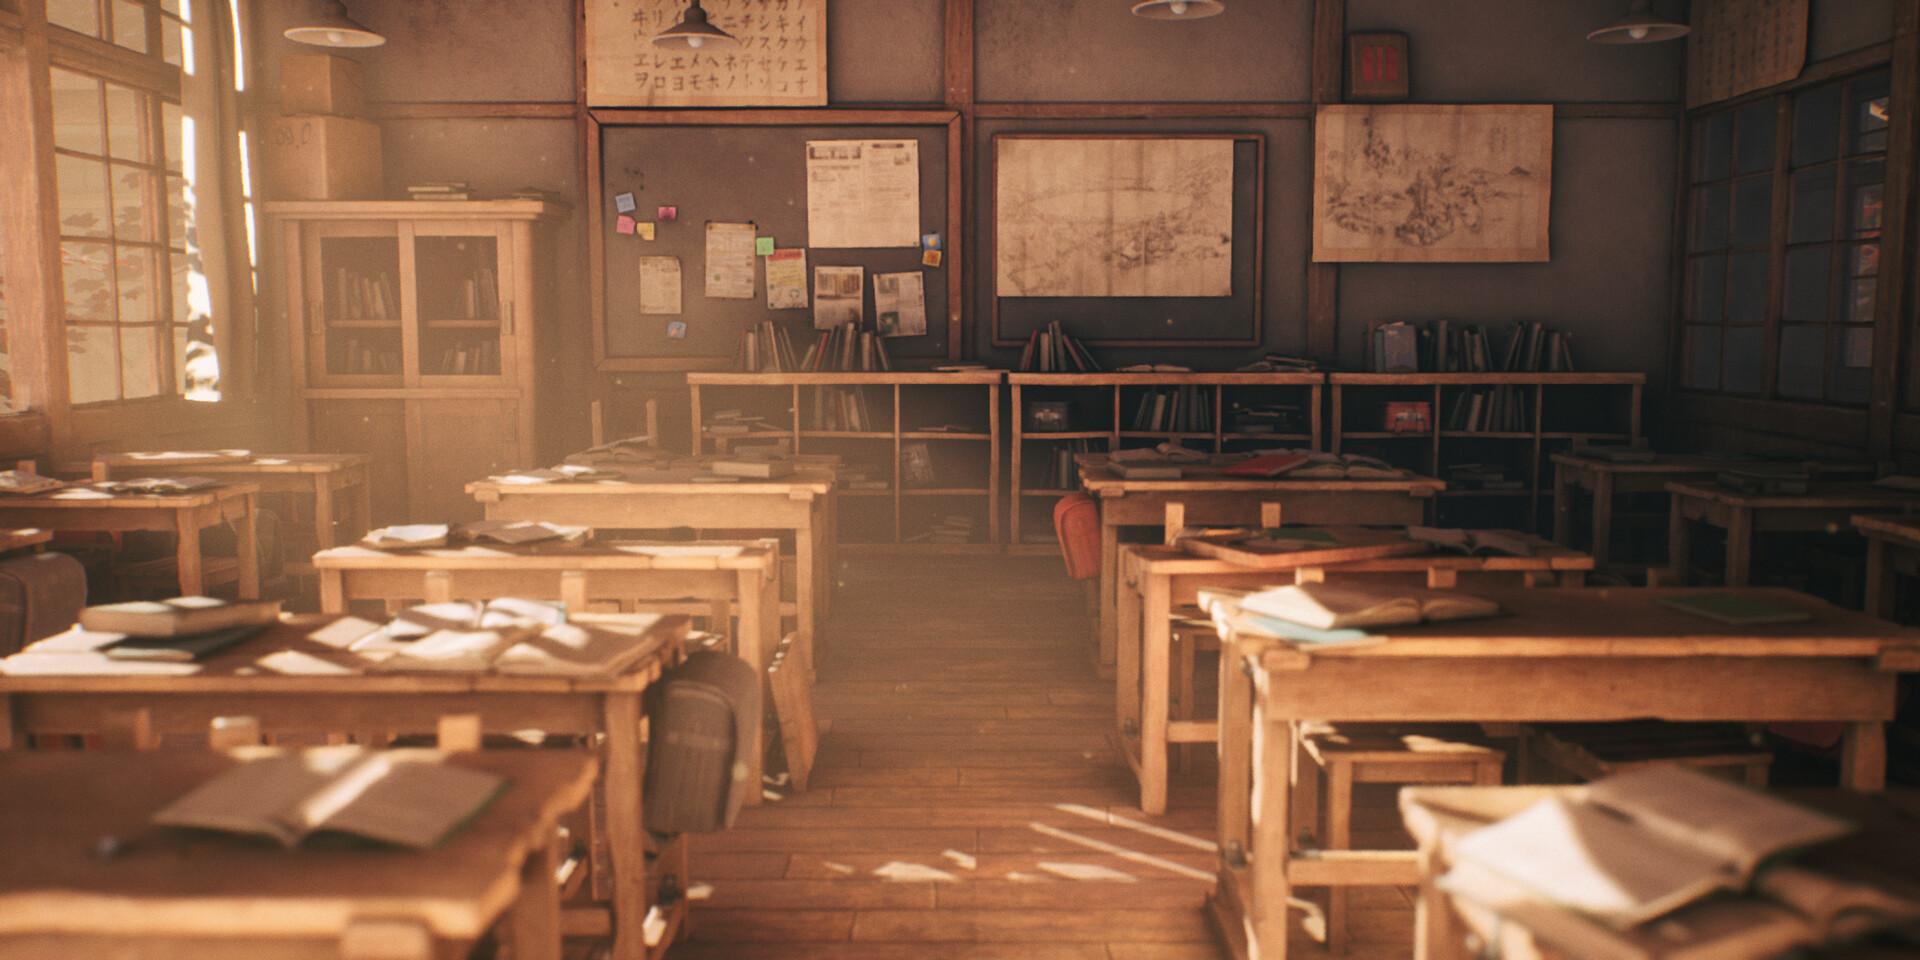 Agancg_UE4_tutorial_Old-Japanese-Classroom03